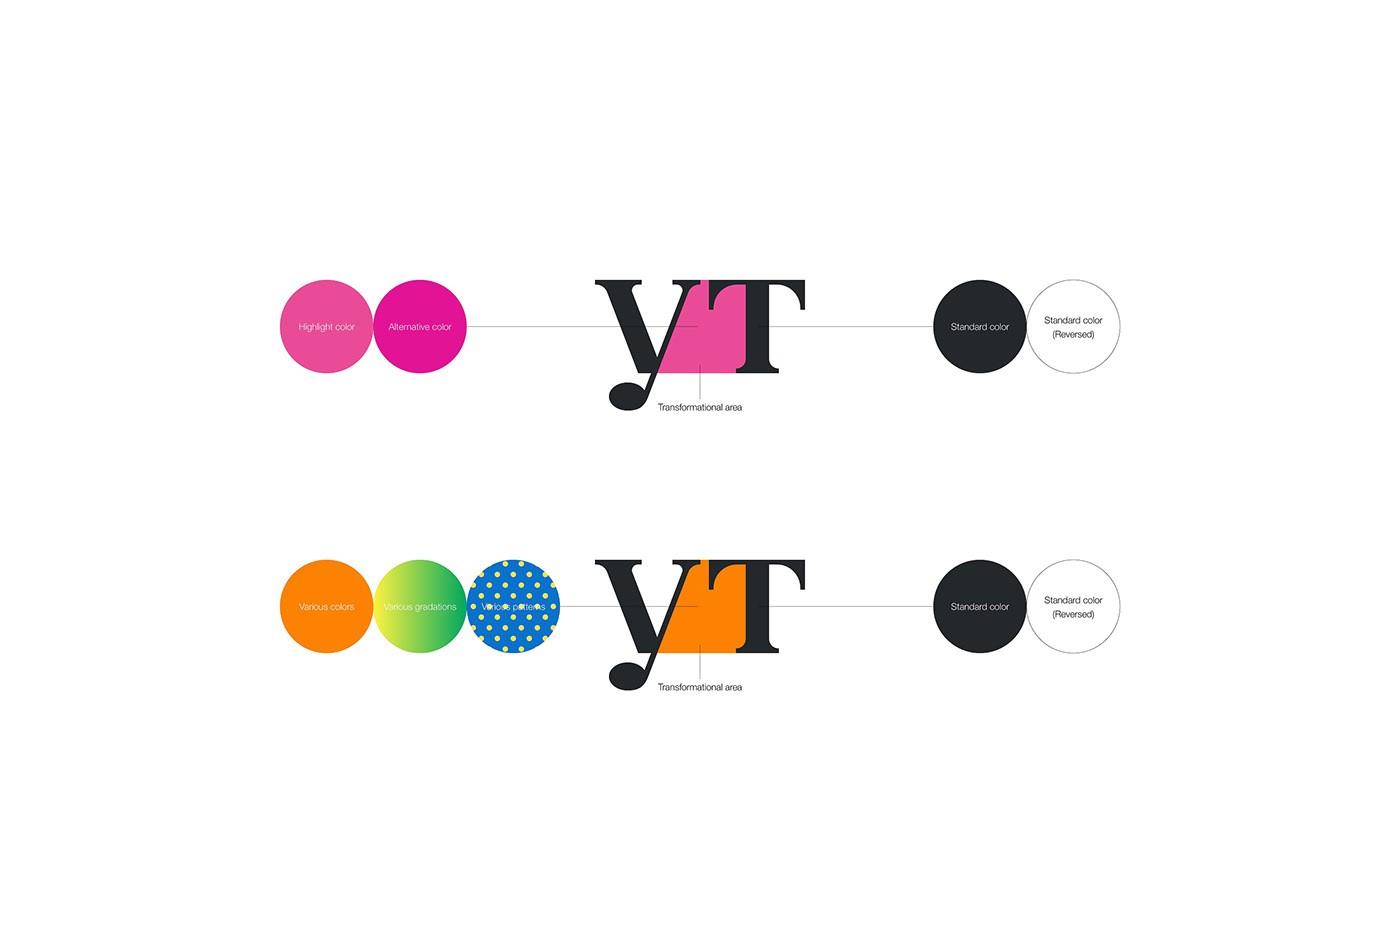 化妆品品牌yUKI TAKESHIMA动感VI设计